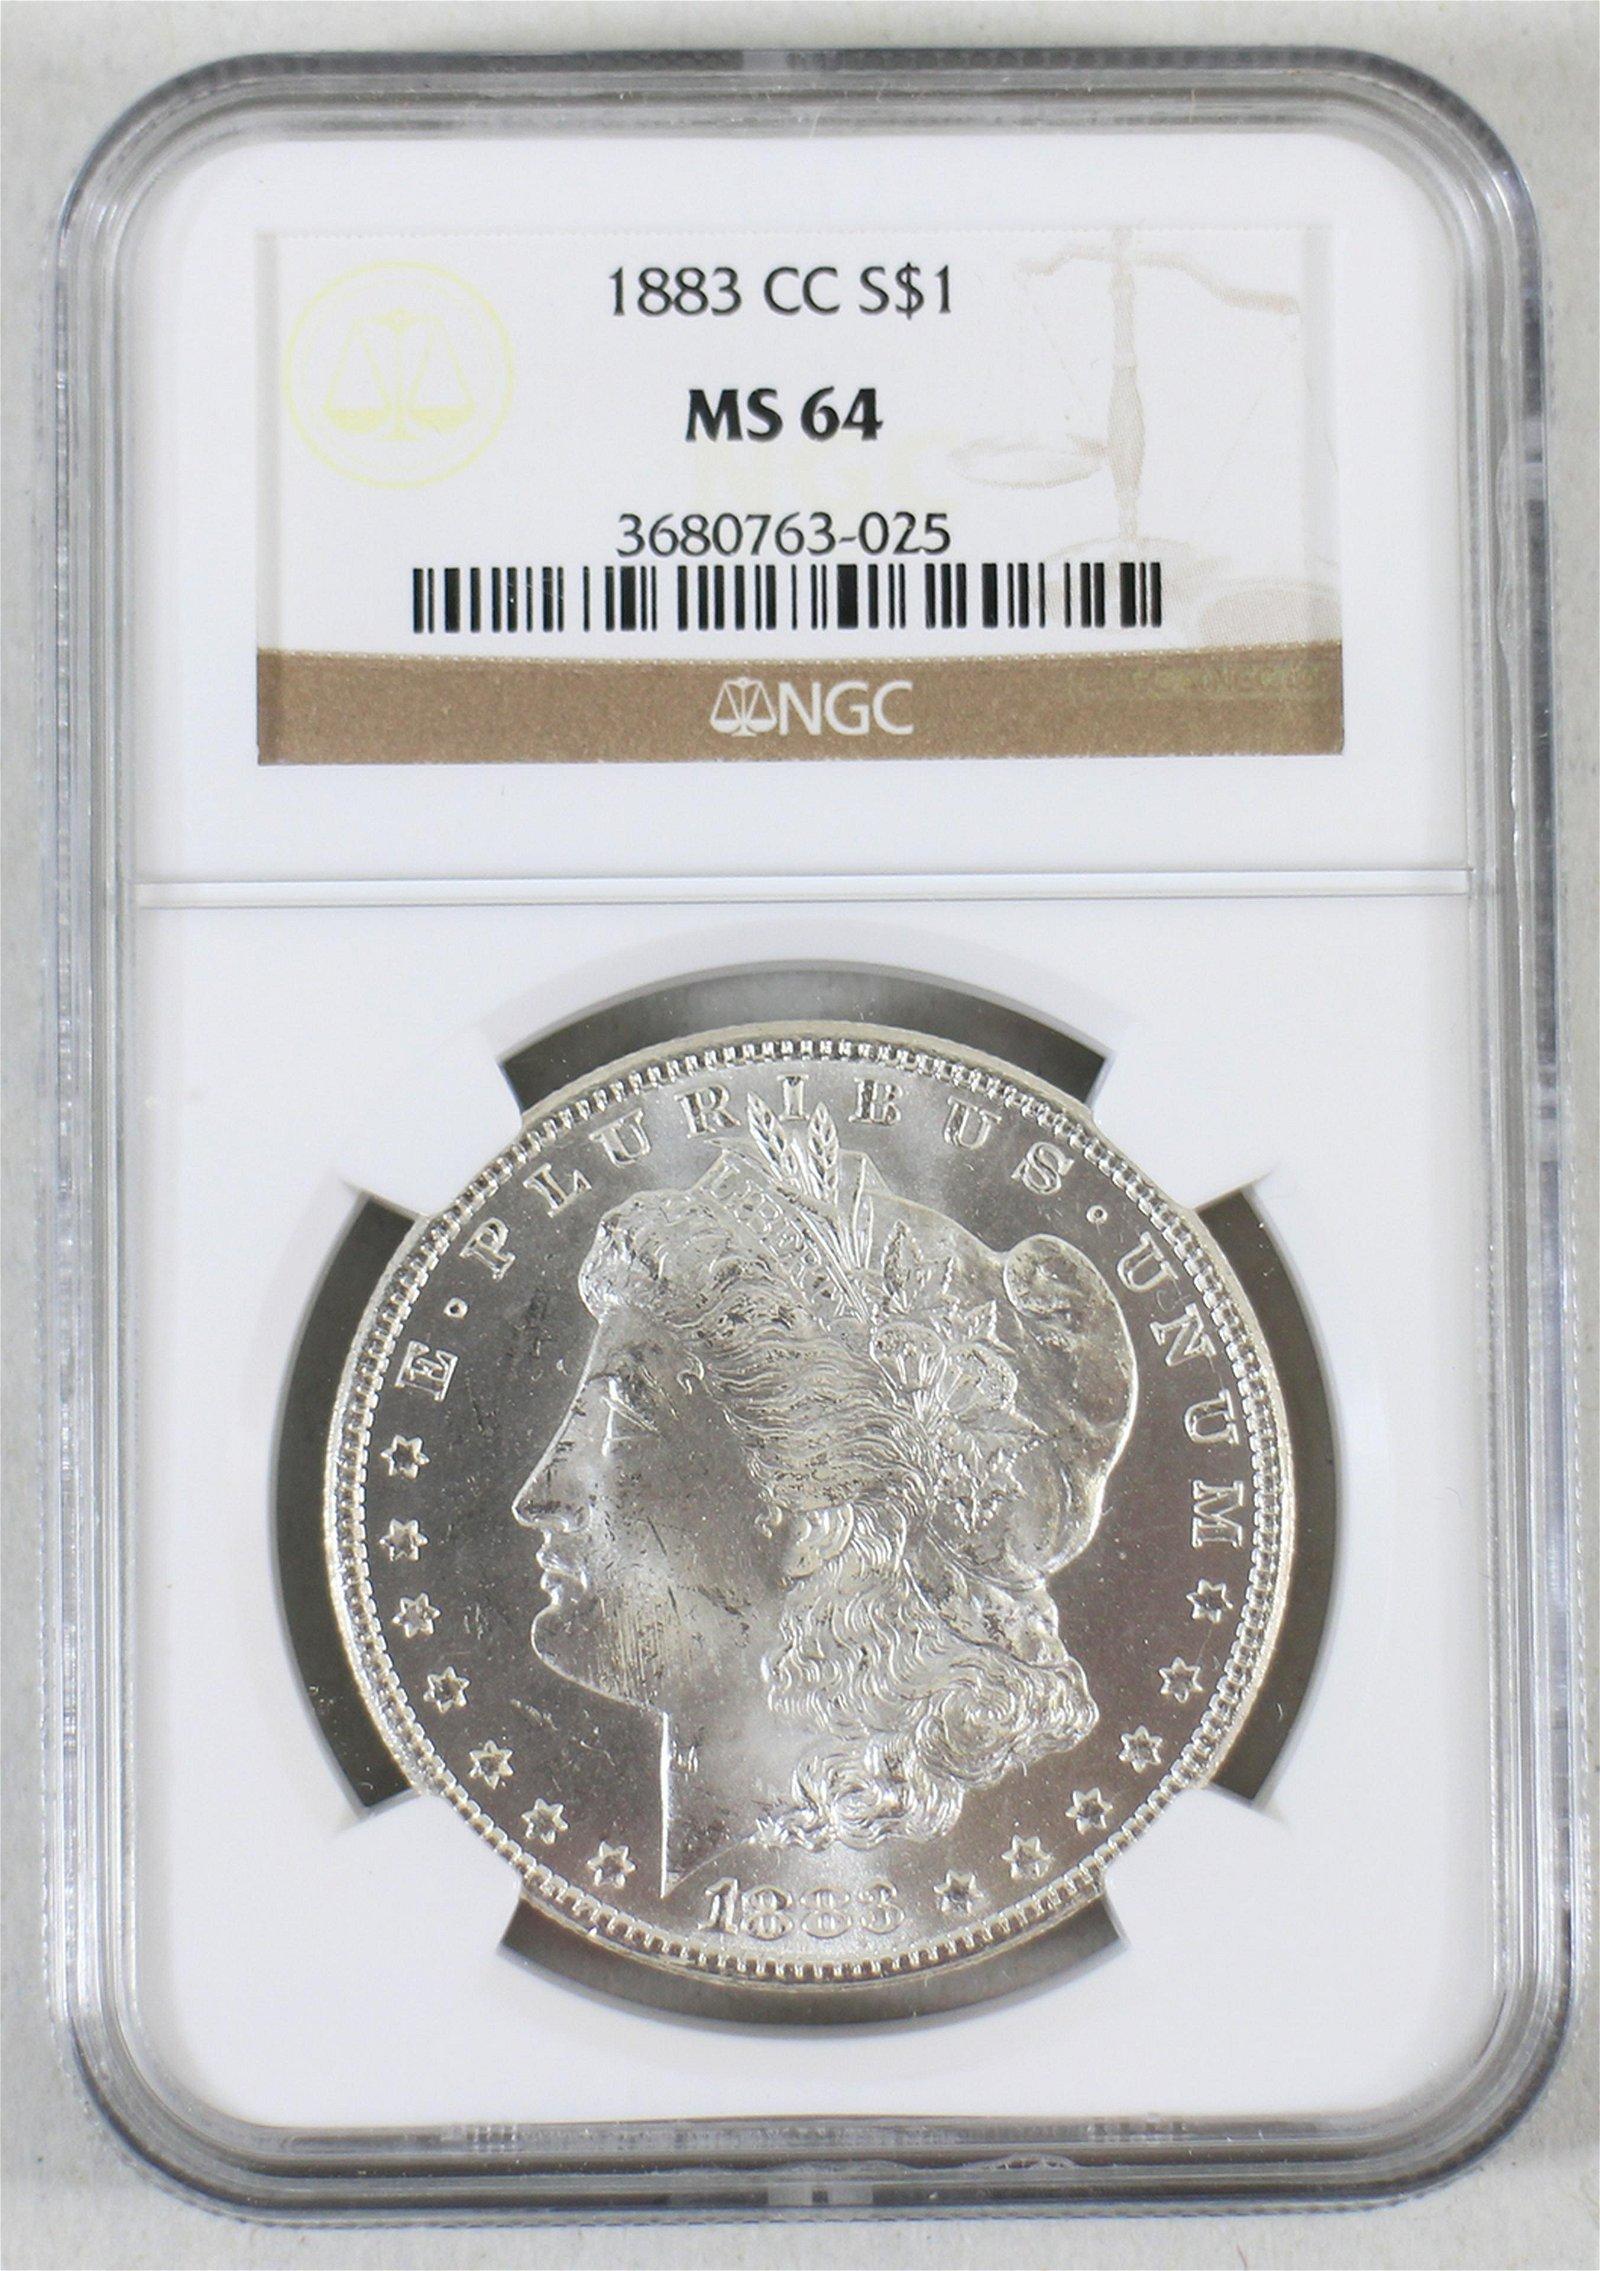 MS64 1883 CARSON CITY MORGAN DOLLAR